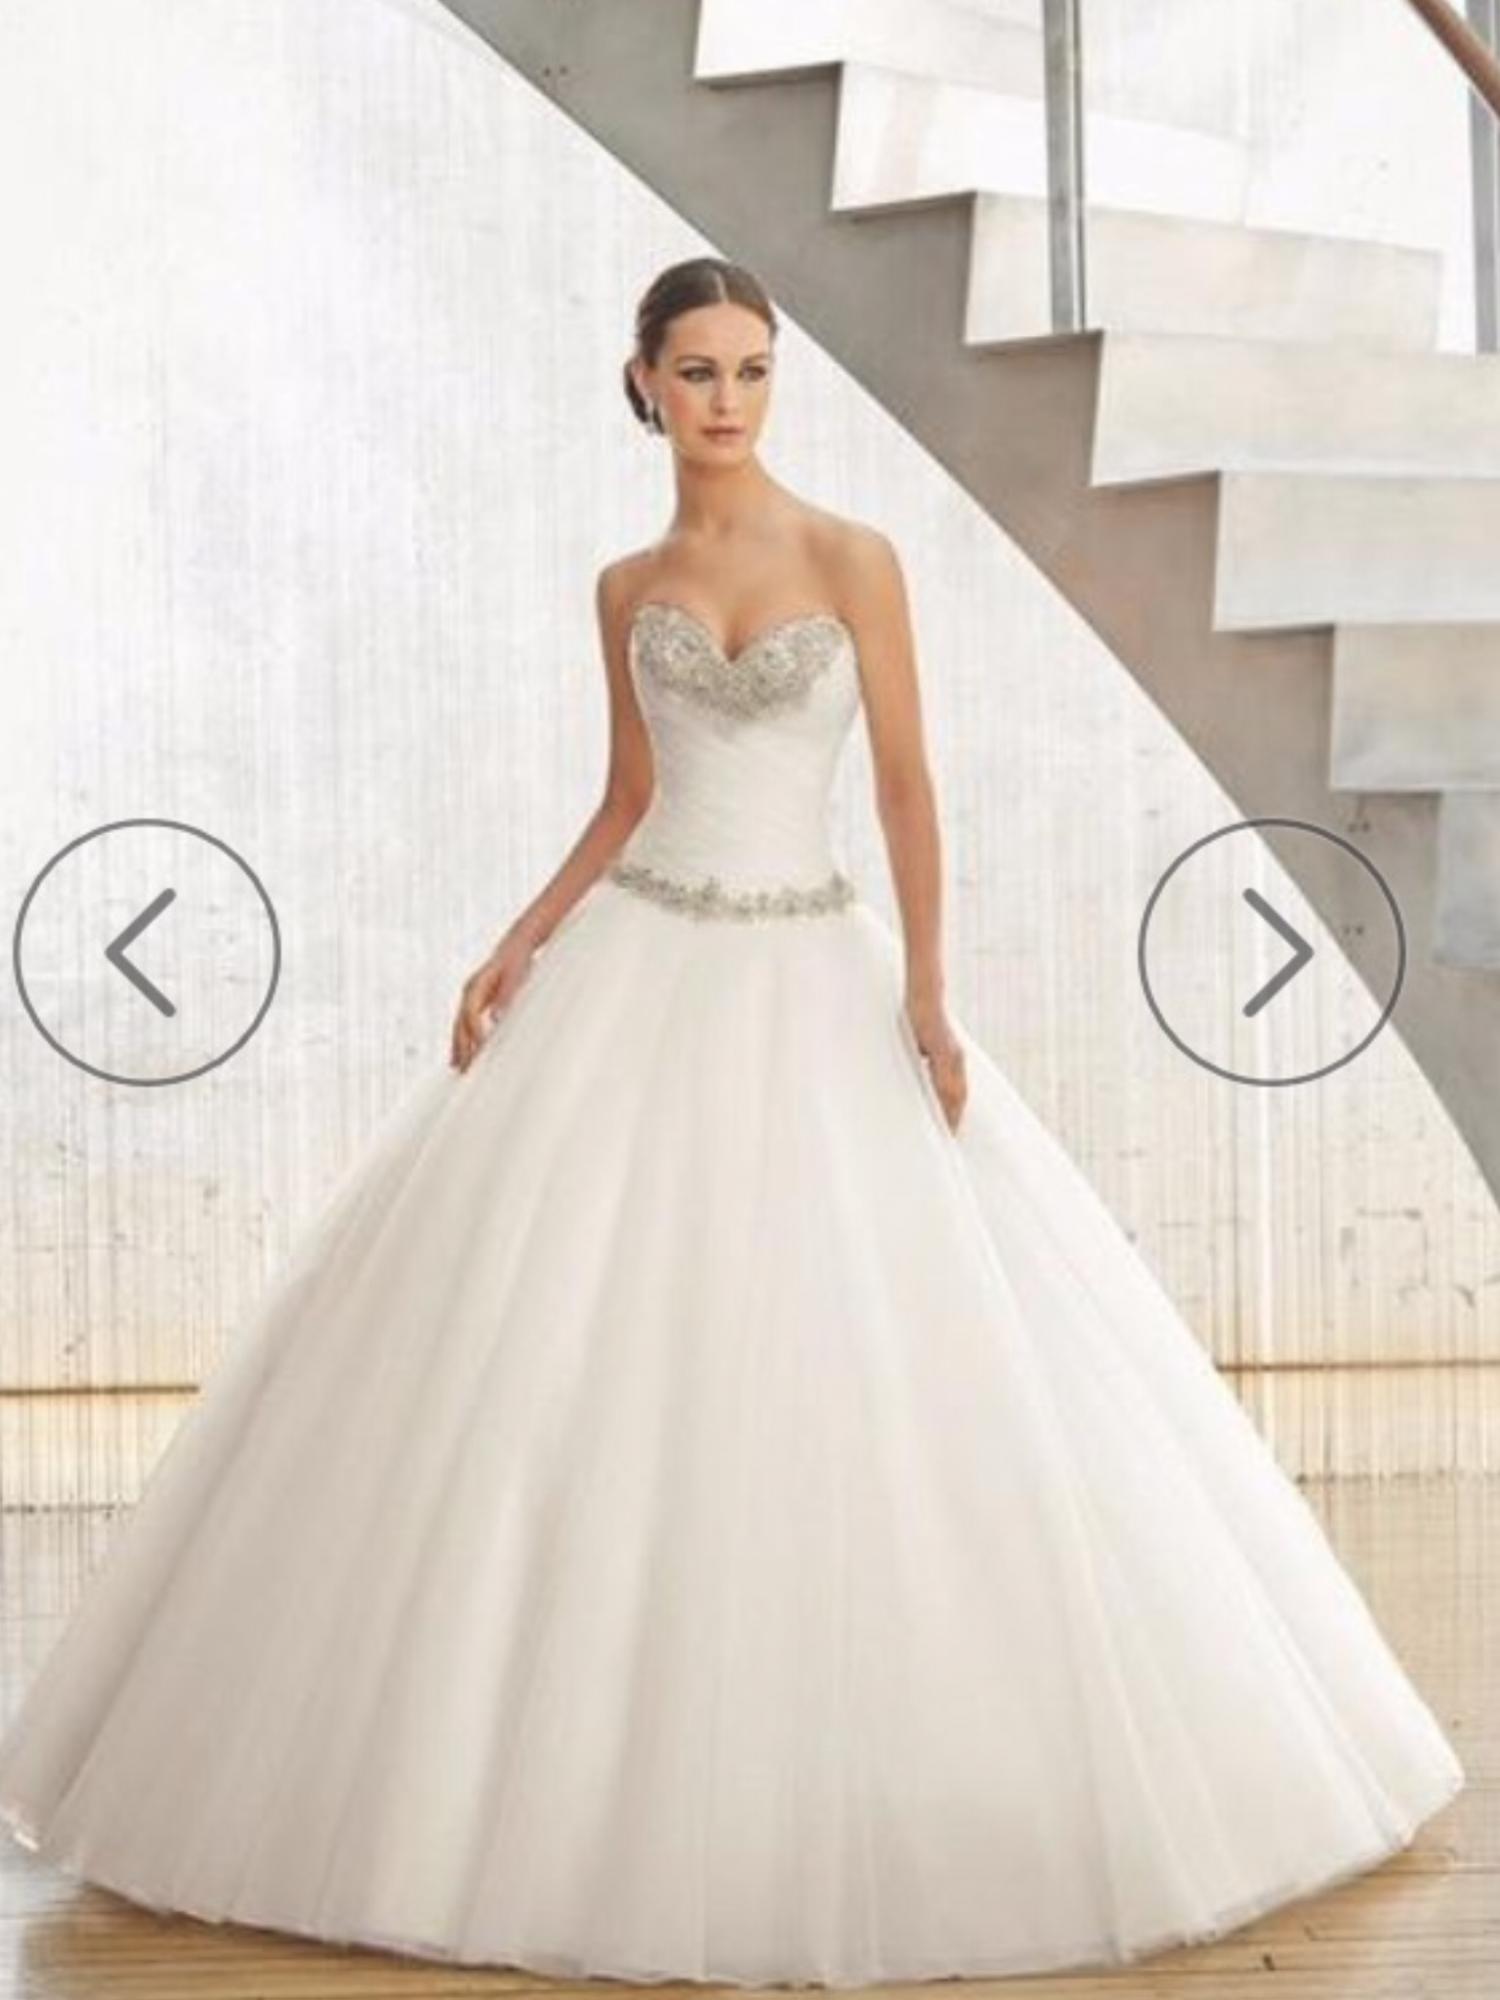 En mulig kjole fra panayotis, som kan fået på udsalg til 6200!